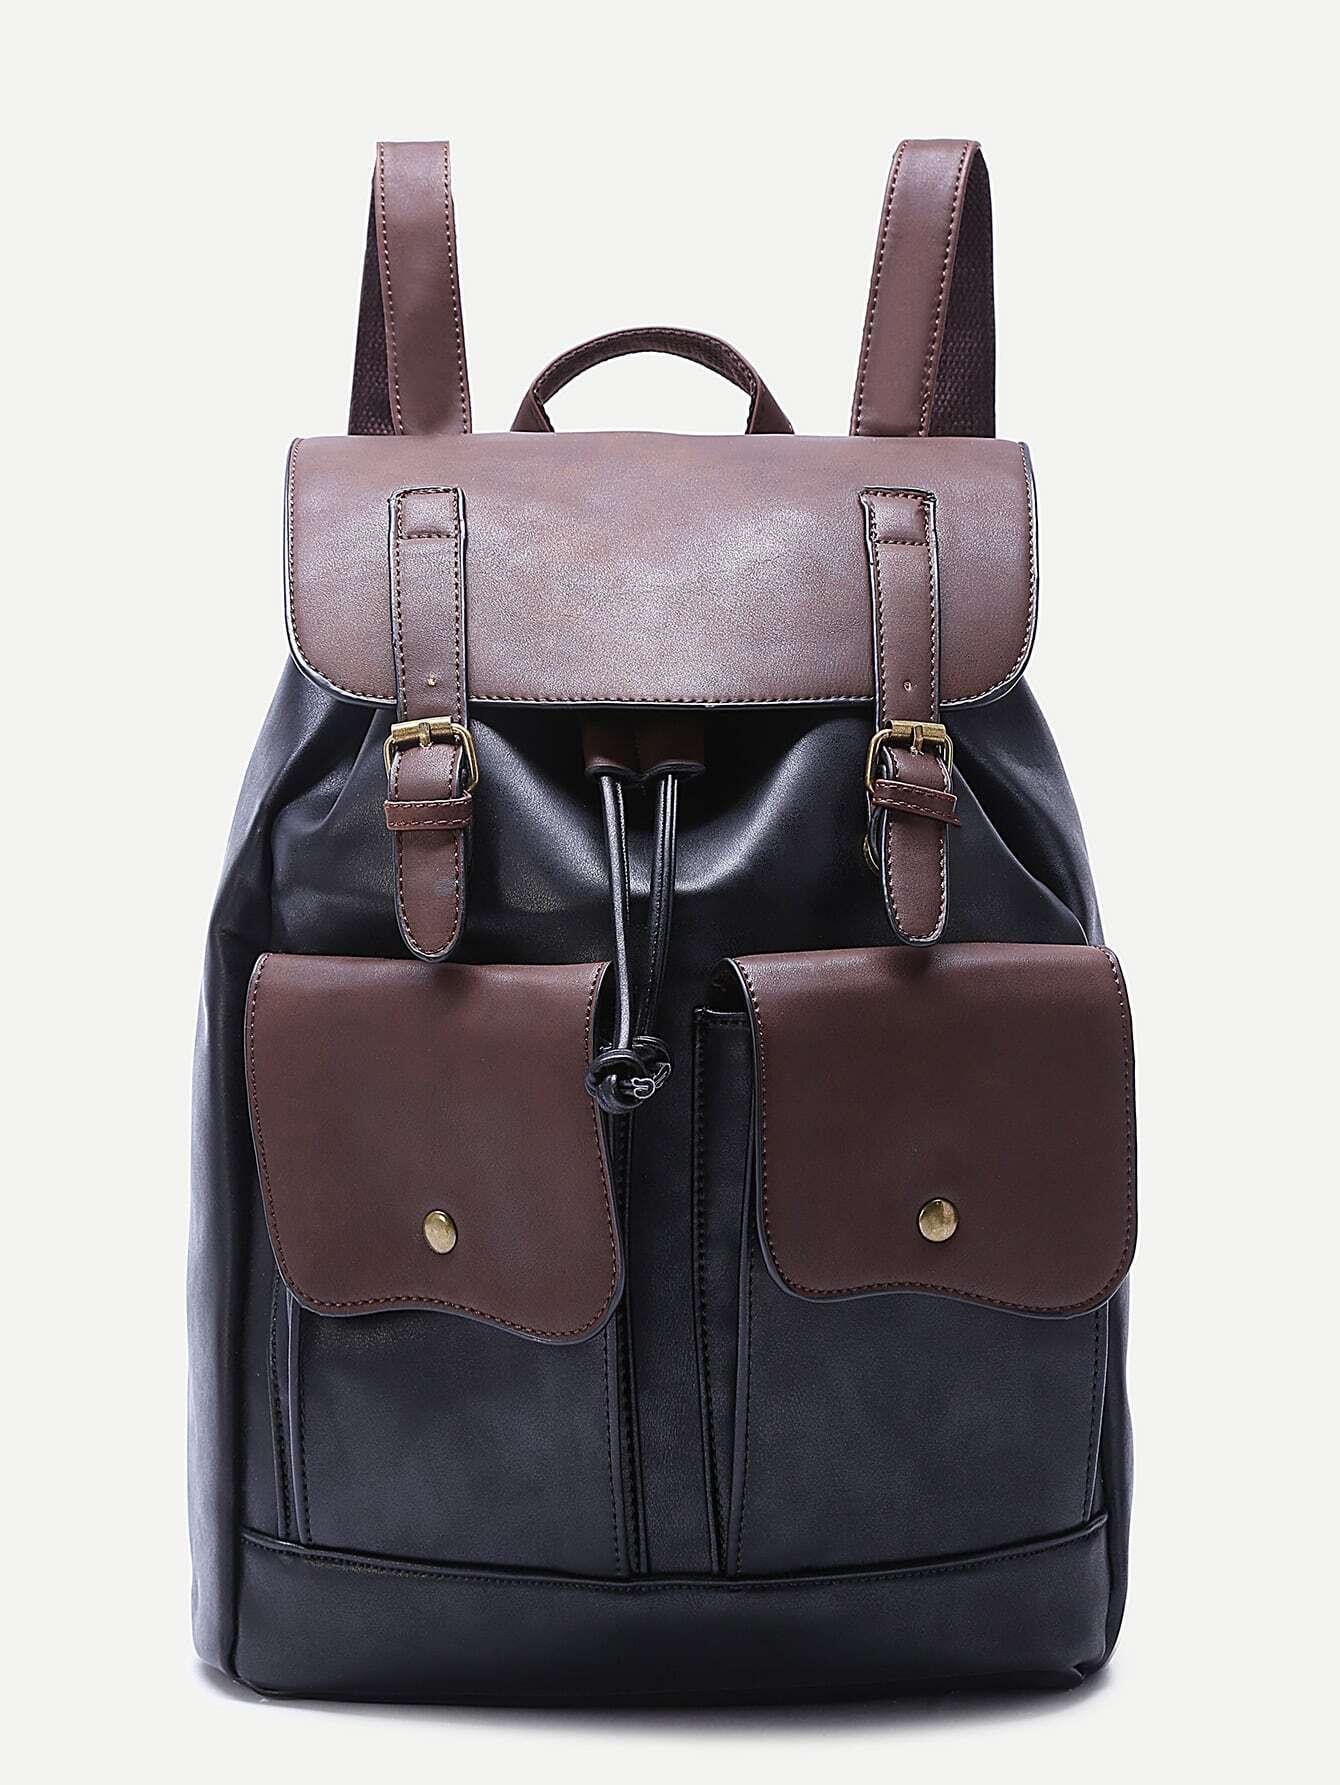 Black Double Pocket Buckled Drawstring PU BackpackBlack Double Pocket Buckled Drawstring PU Backpack<br><br>color: Black<br>size: None